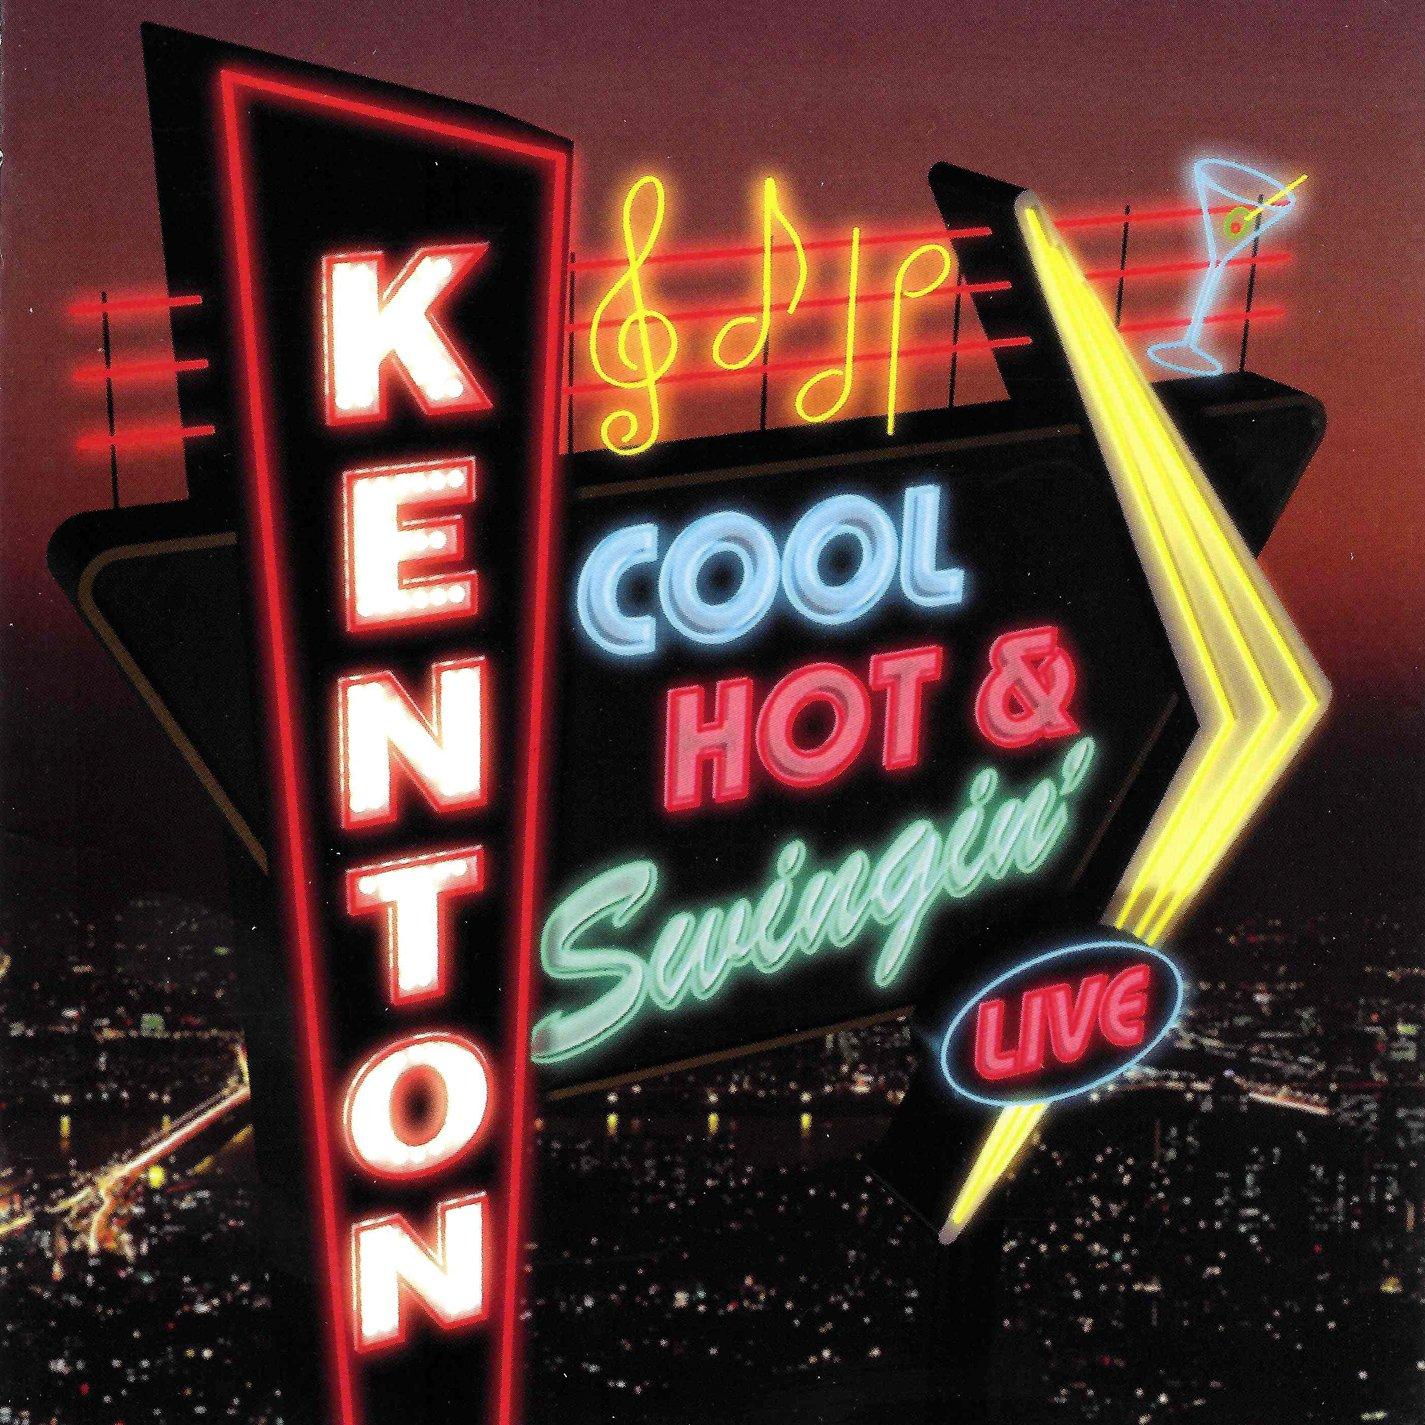 Cool, Hot & Swingin' by deep blue